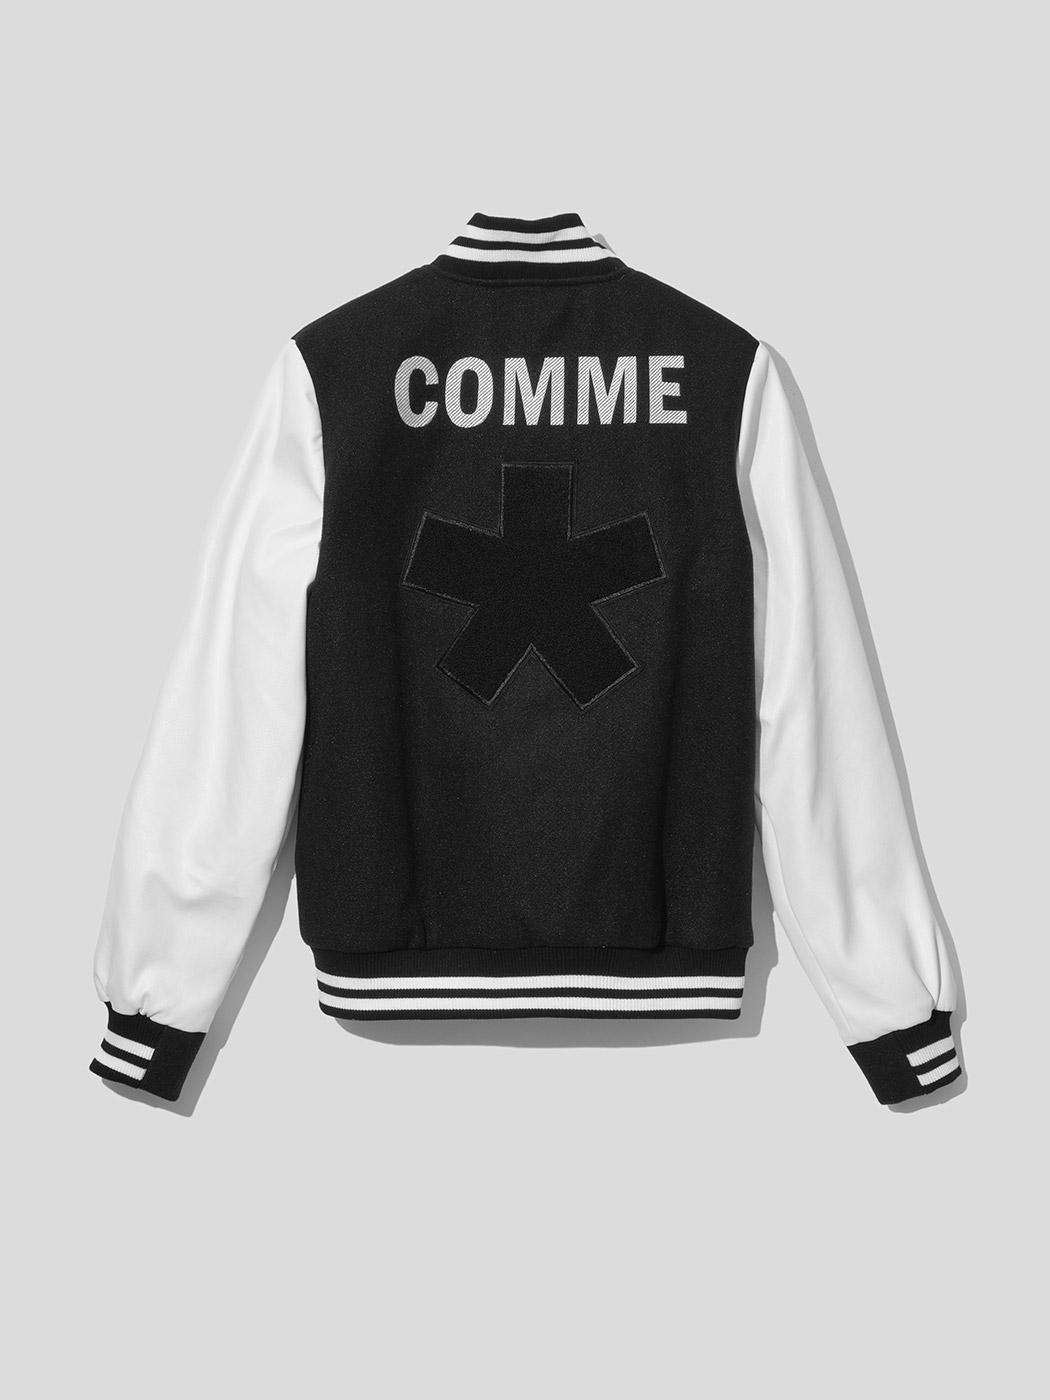 BOMBER - CDFD1521 - COMME DES FKDOWN